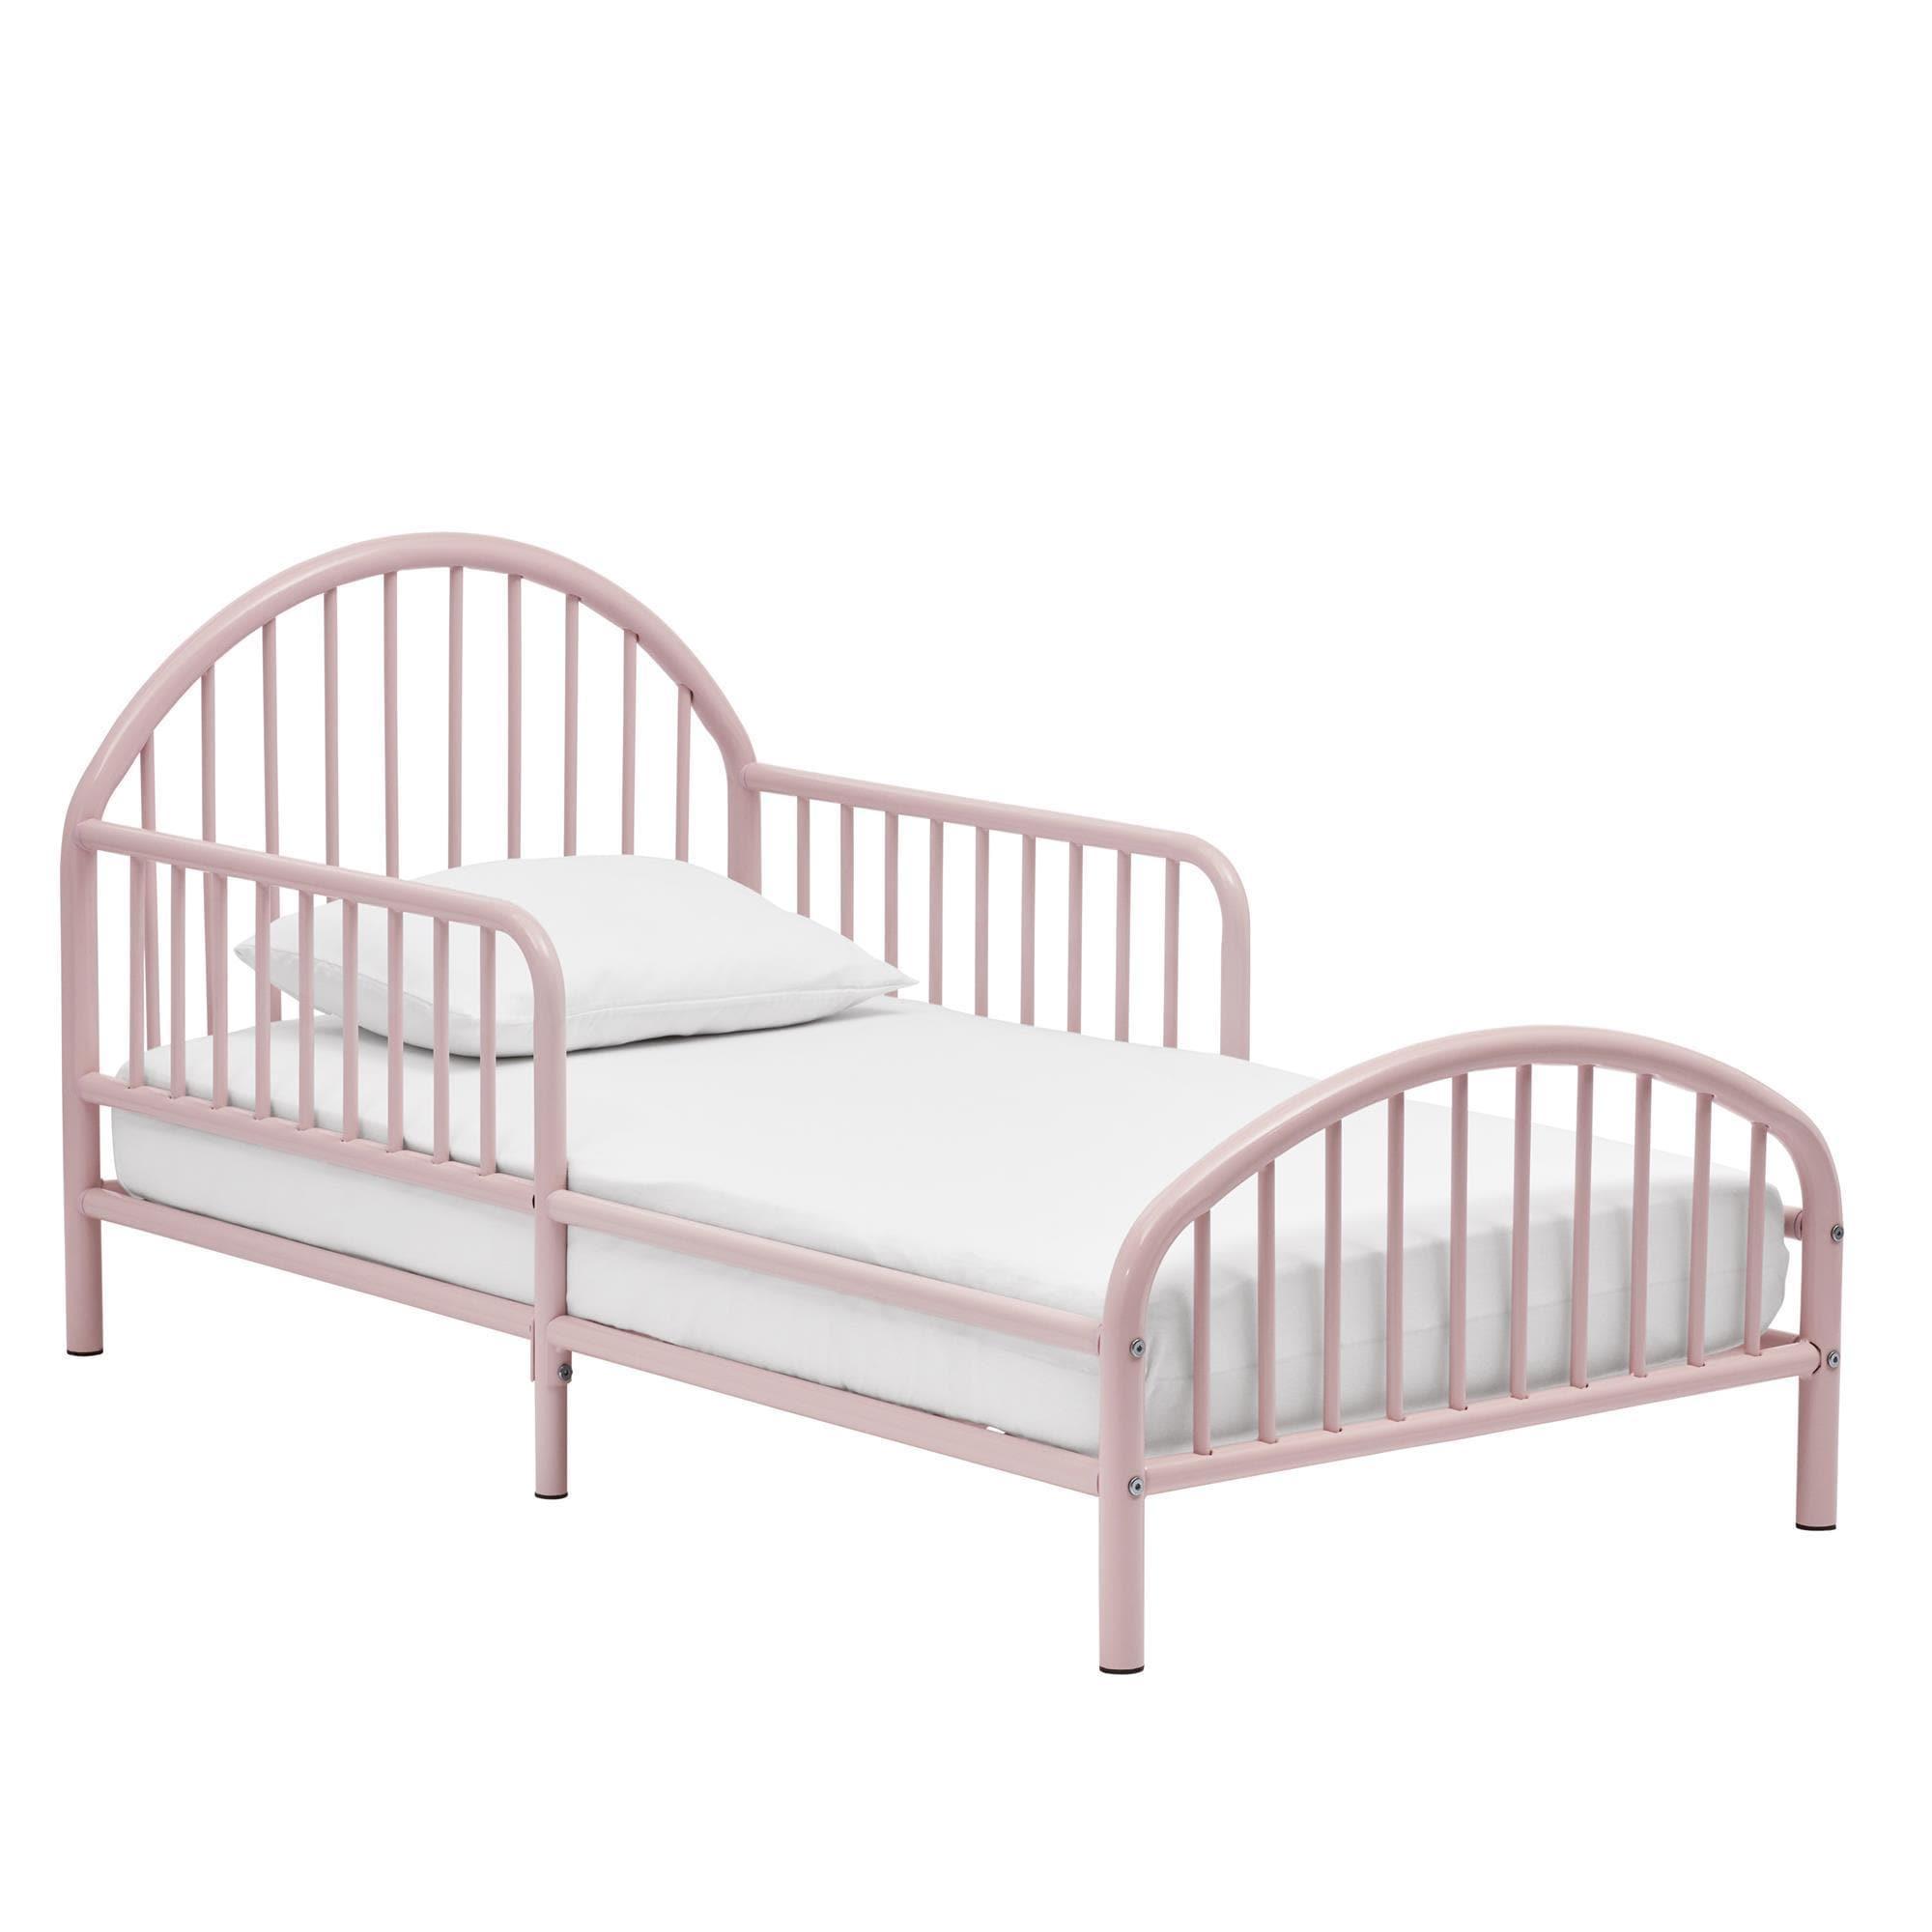 novogratz prism metal toddler bed free shipping today overstockcom 24267122 - Metal Toddler Bed Frame